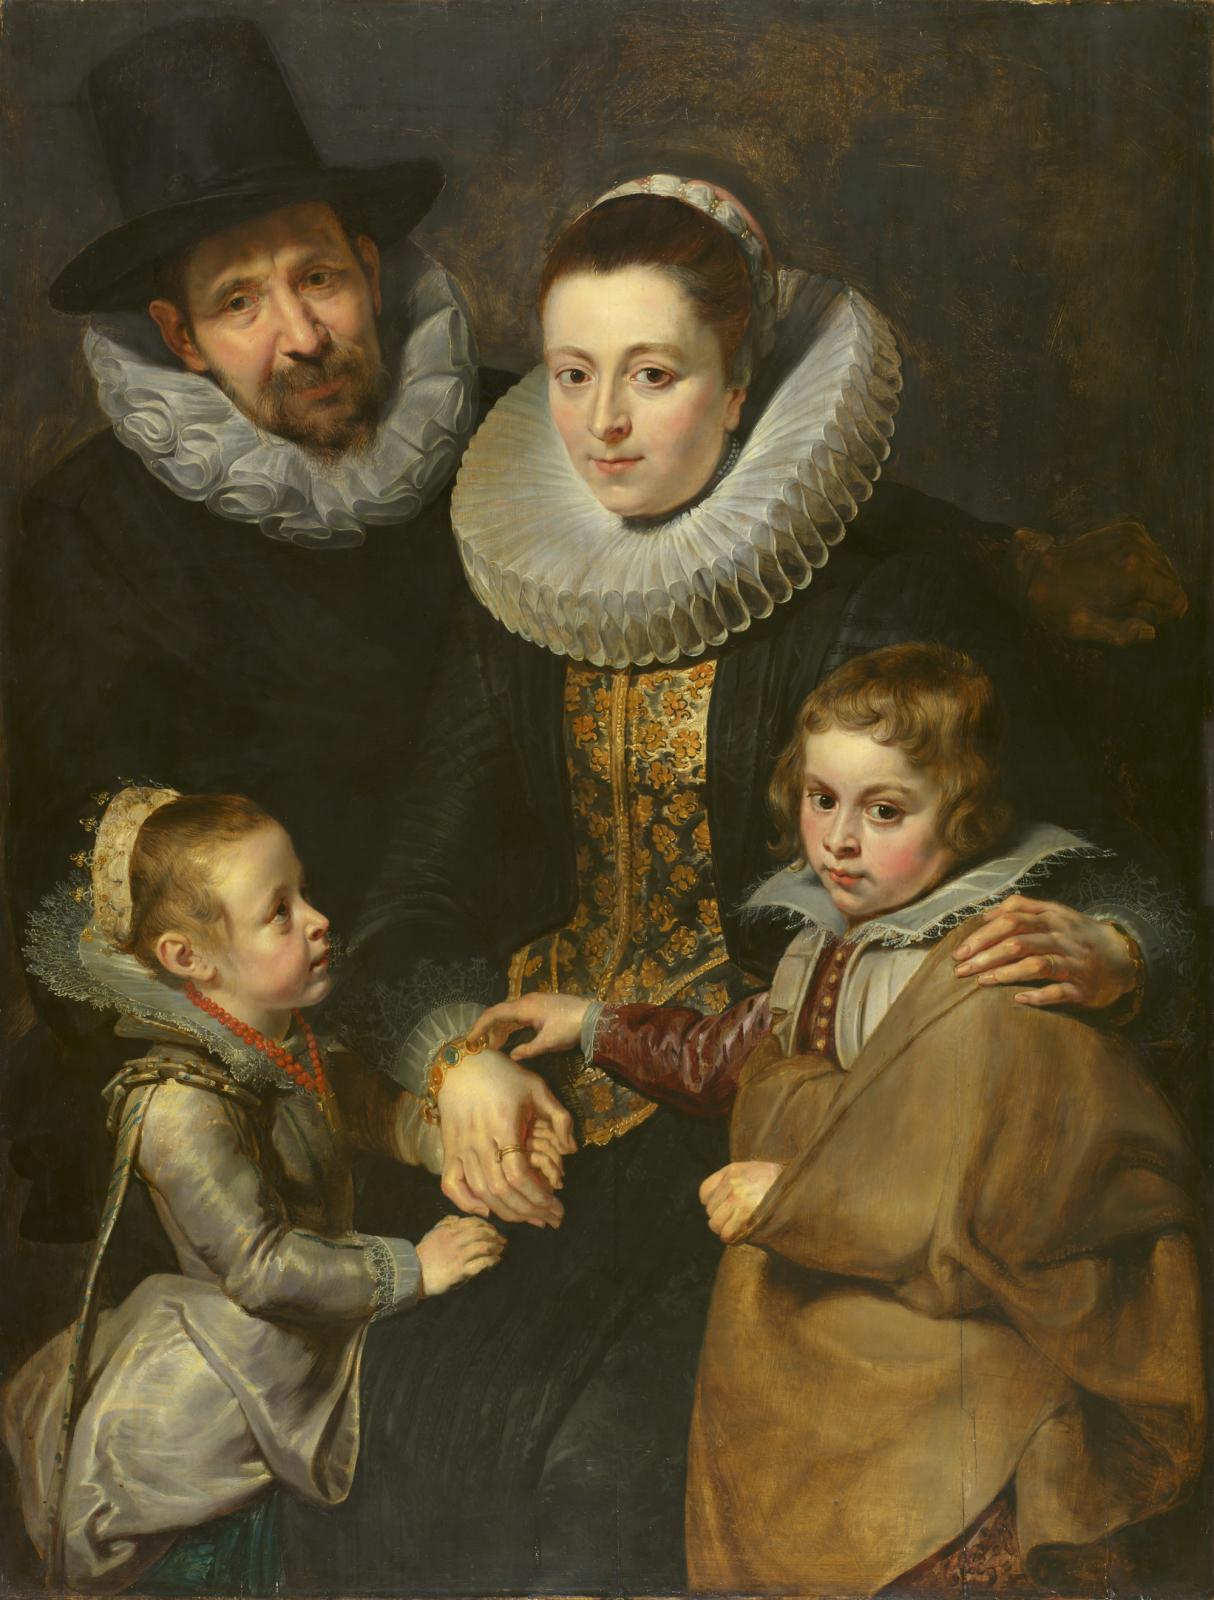 Courtauld Galleries